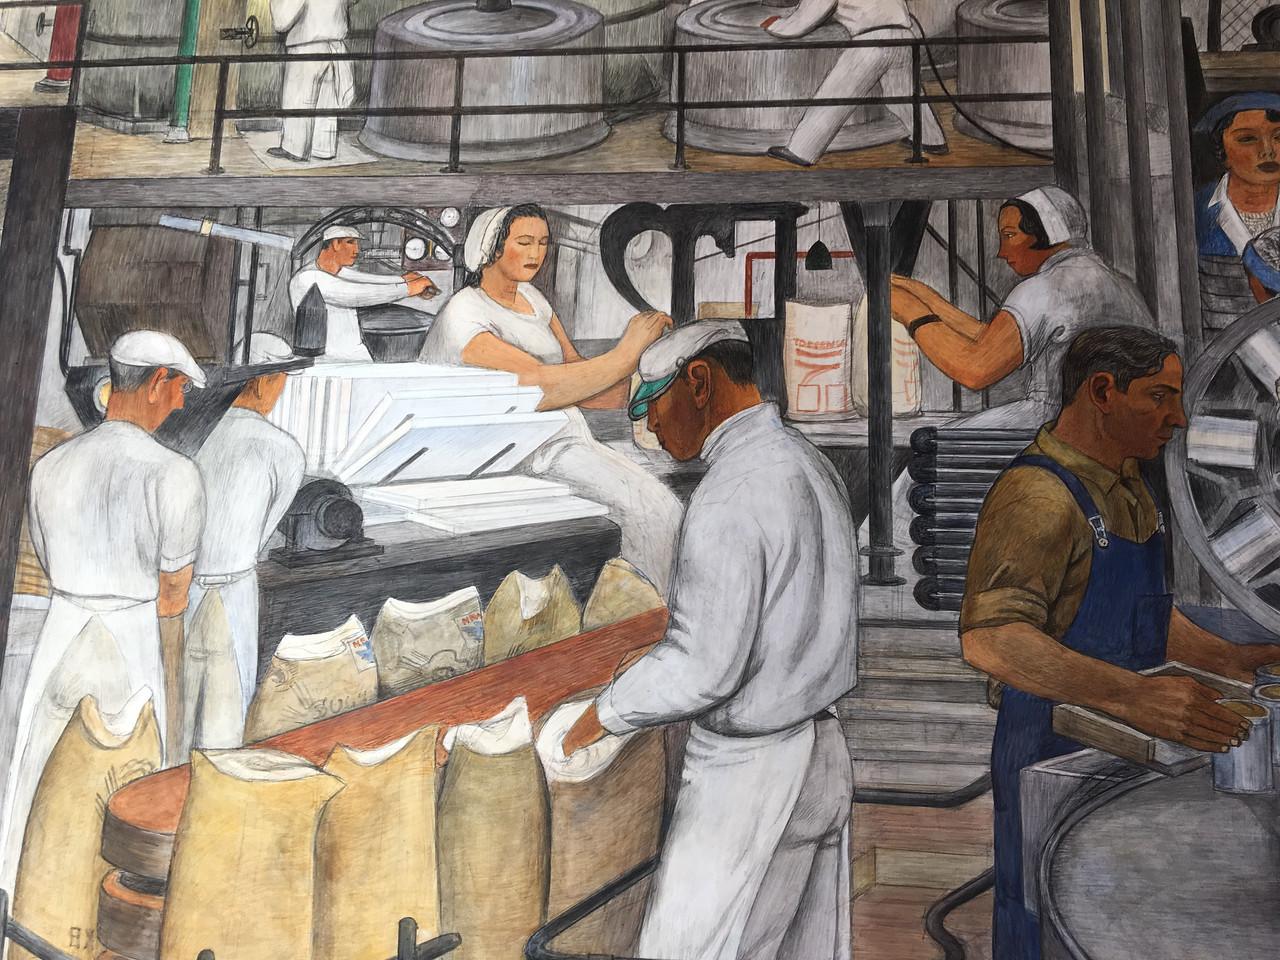 Amazing murals in Coit Tower